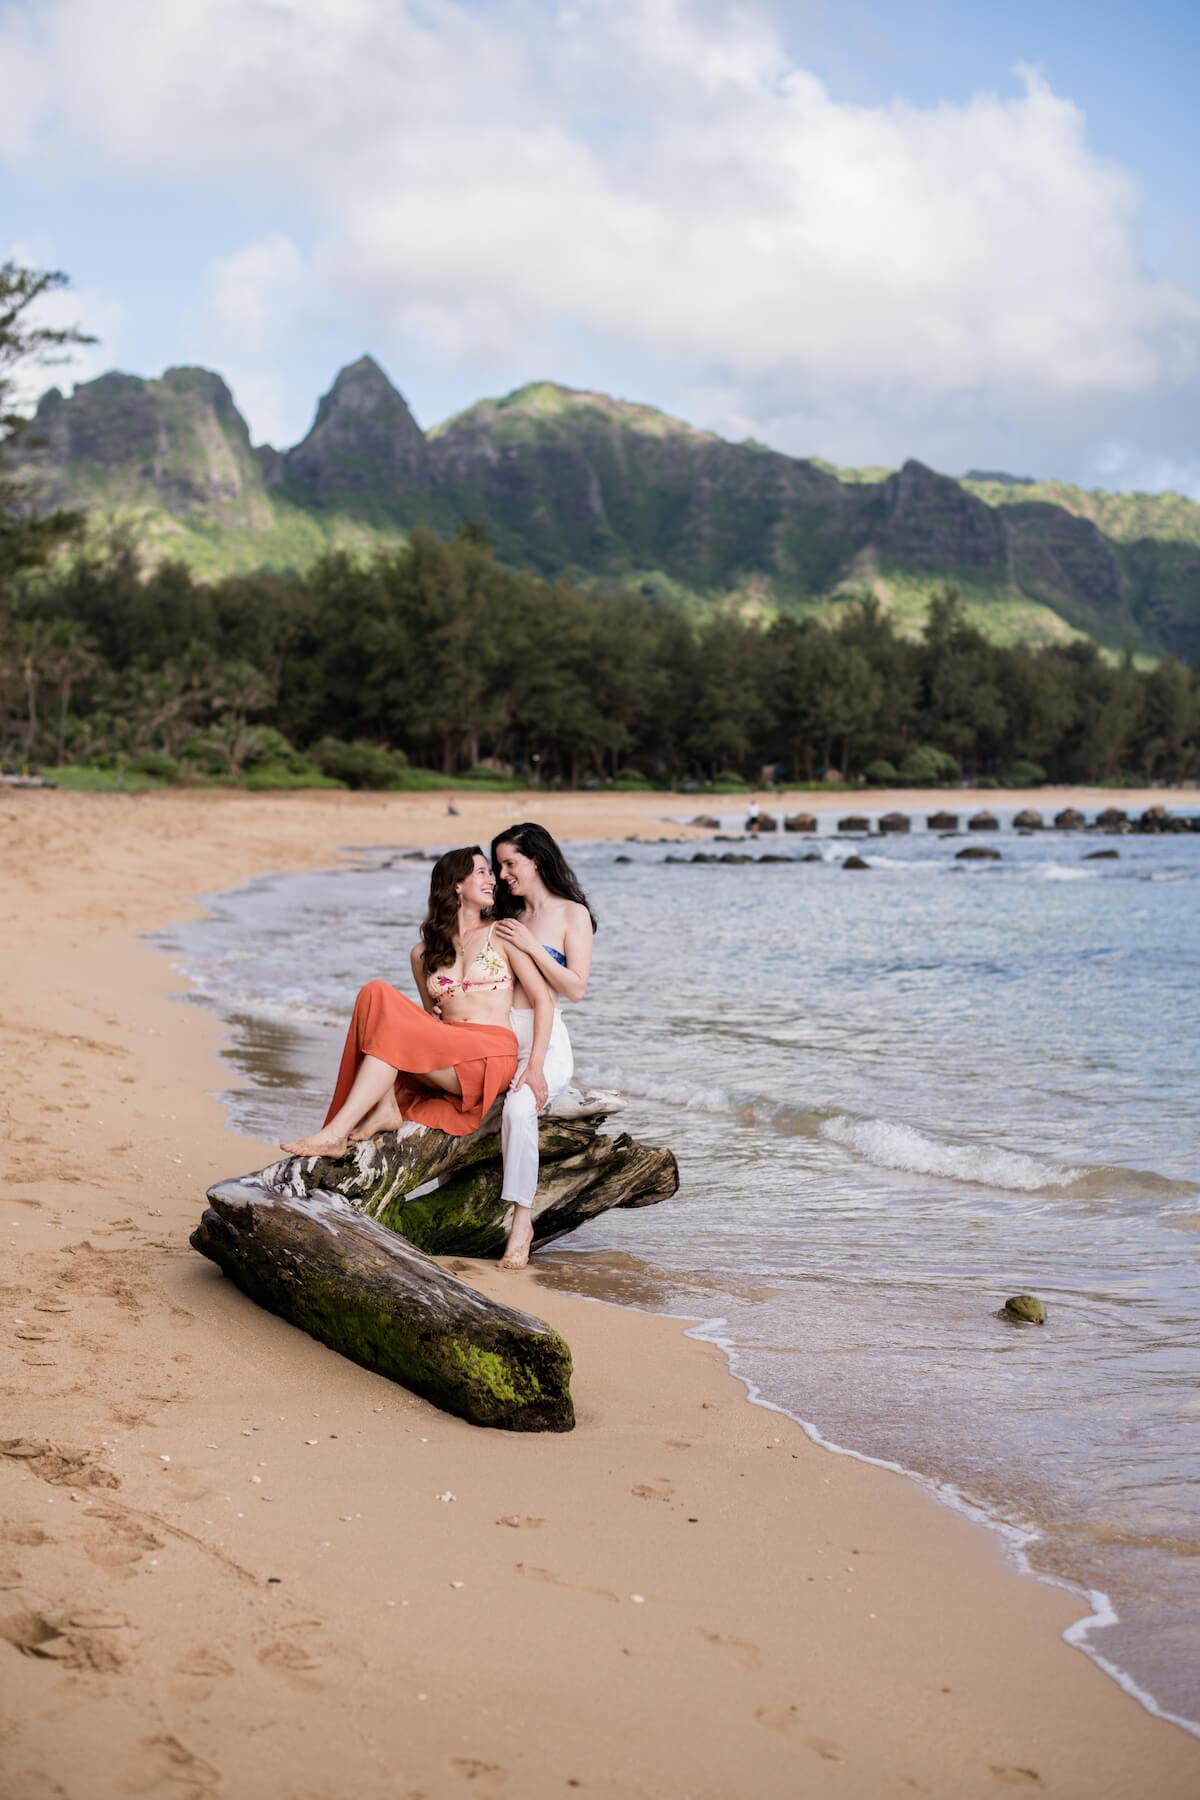 Lesbian couple on honeymoon in hawaii, travel vacation photoshoot